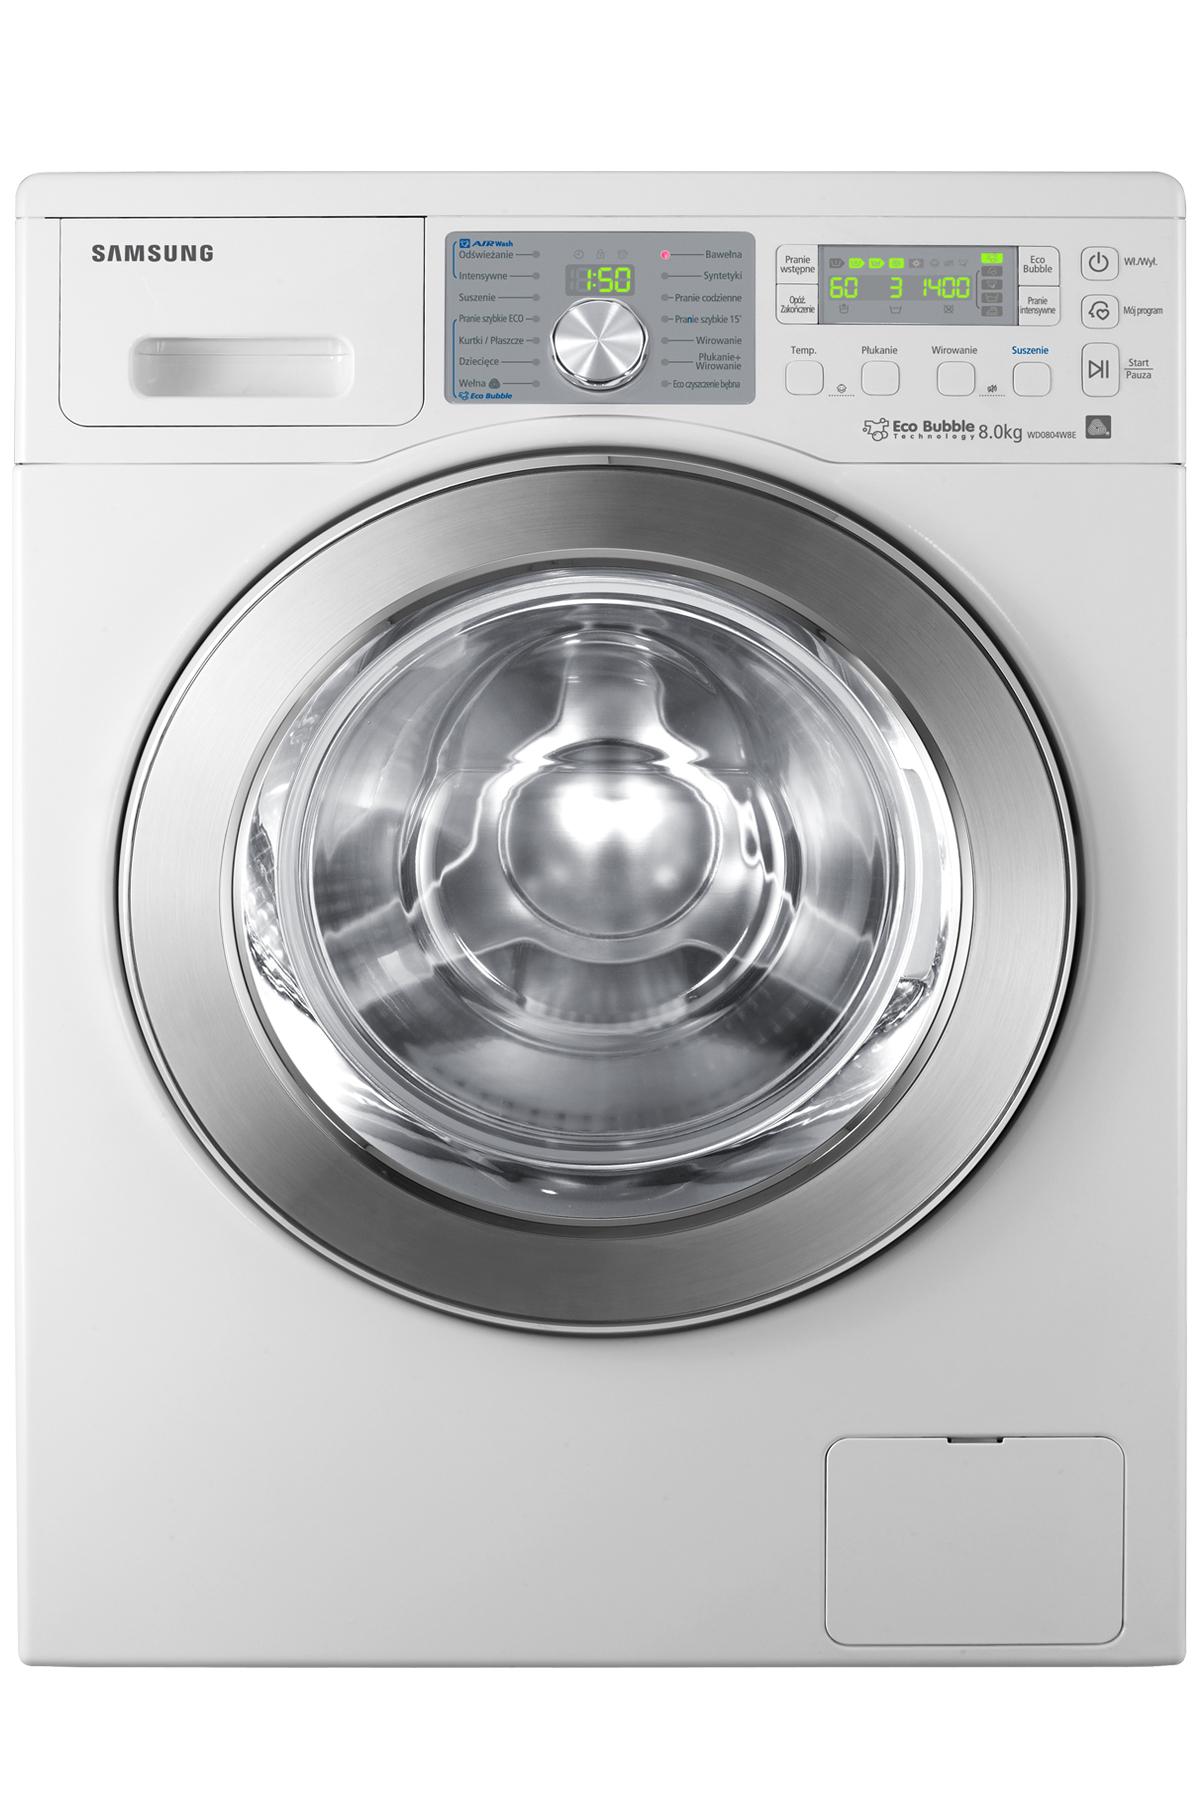 Pralko-suszarka Samsung Eco Bubble